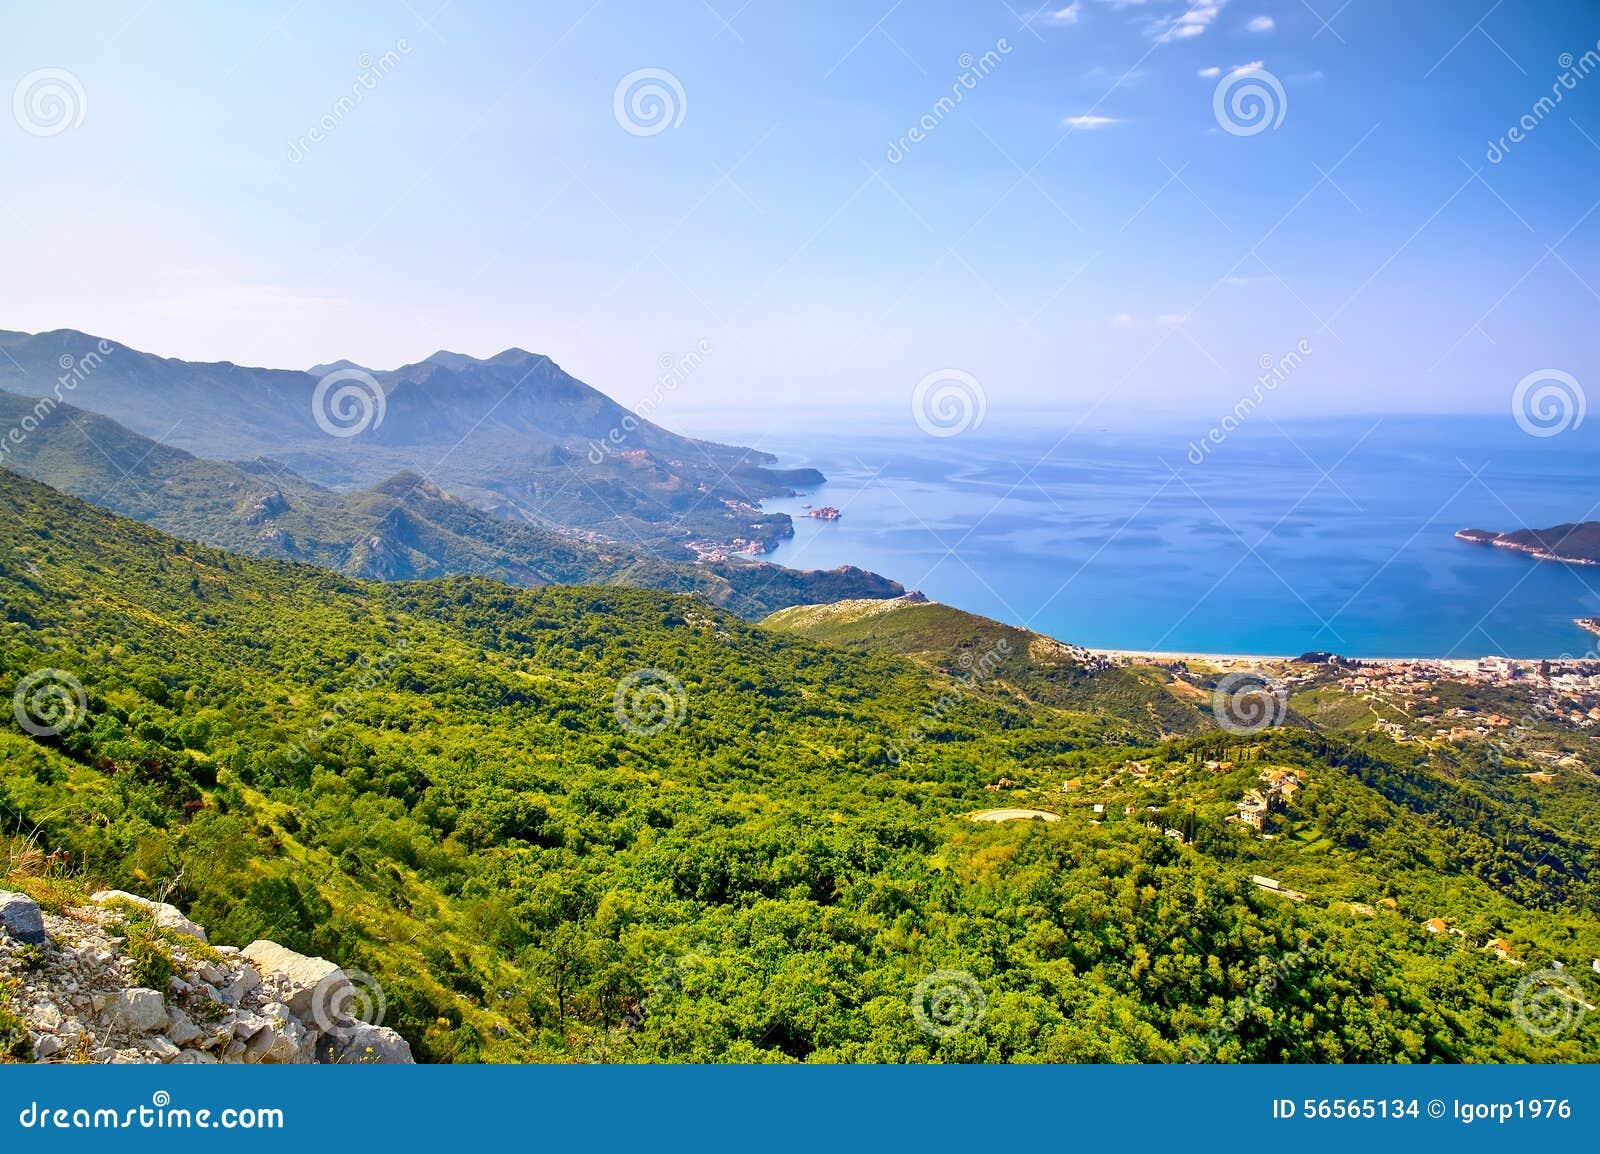 Download Παραλία πρωινού με τη θάλασσα και τις θέες βουνού Μαυροβούνιο Στοκ Εικόνες - εικόνα από έλατο, φυσικός: 56565134